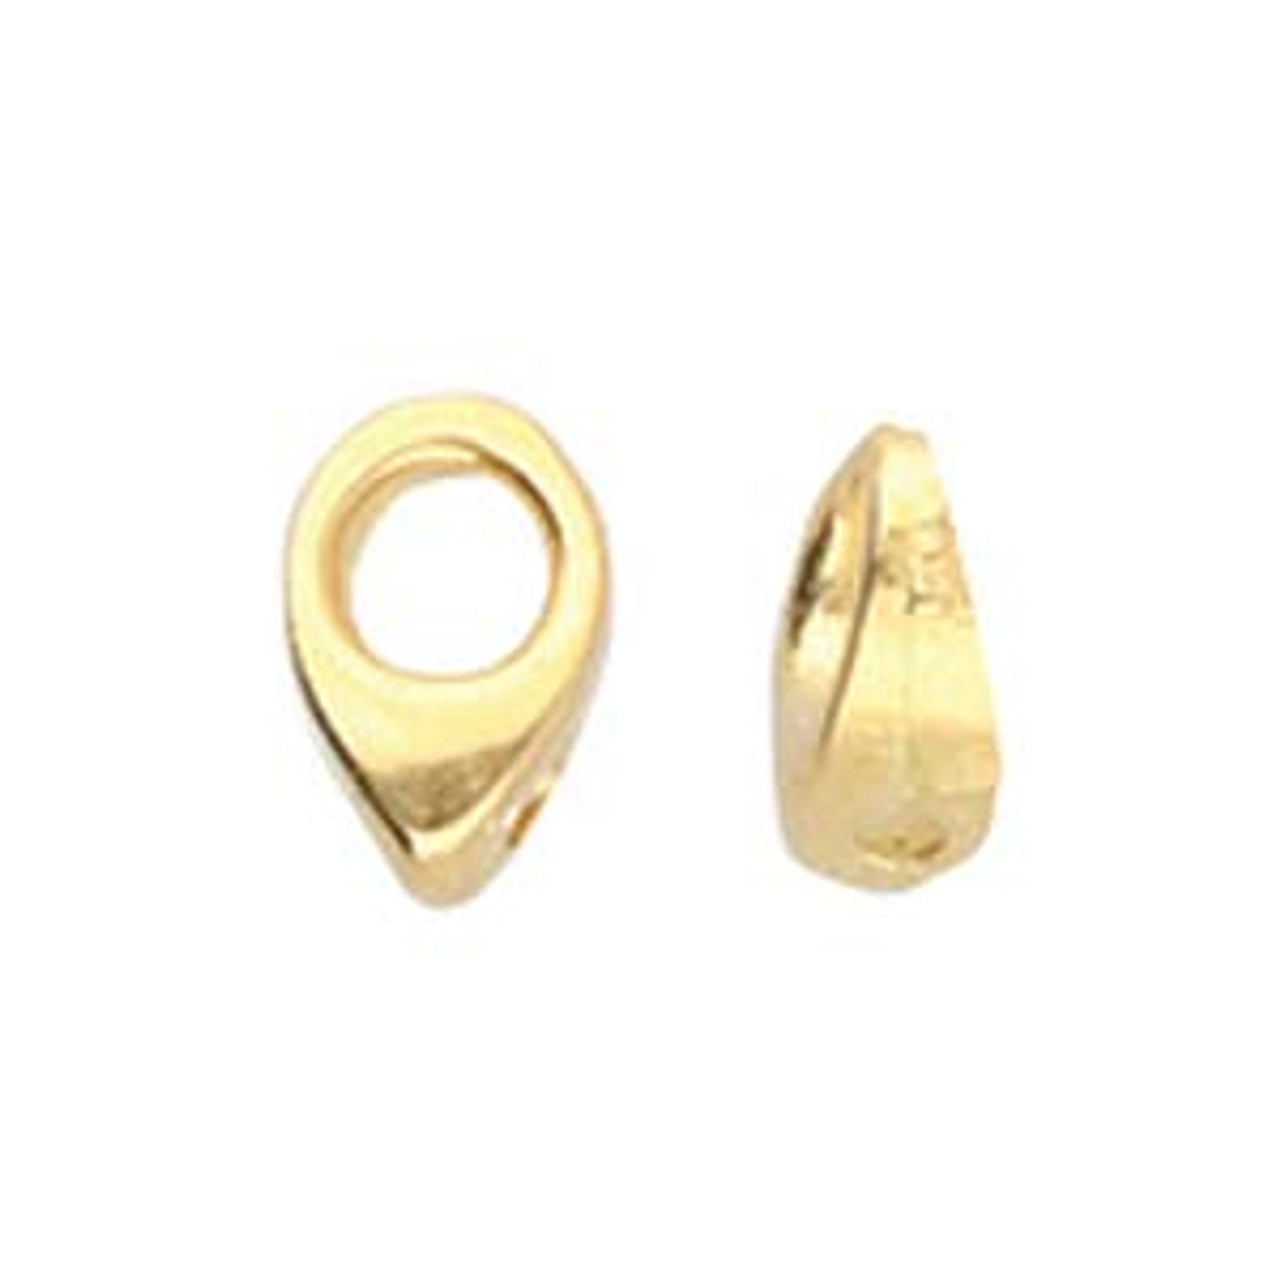 Kolympos Superduo Bead Endings (2pk) Gold Plated